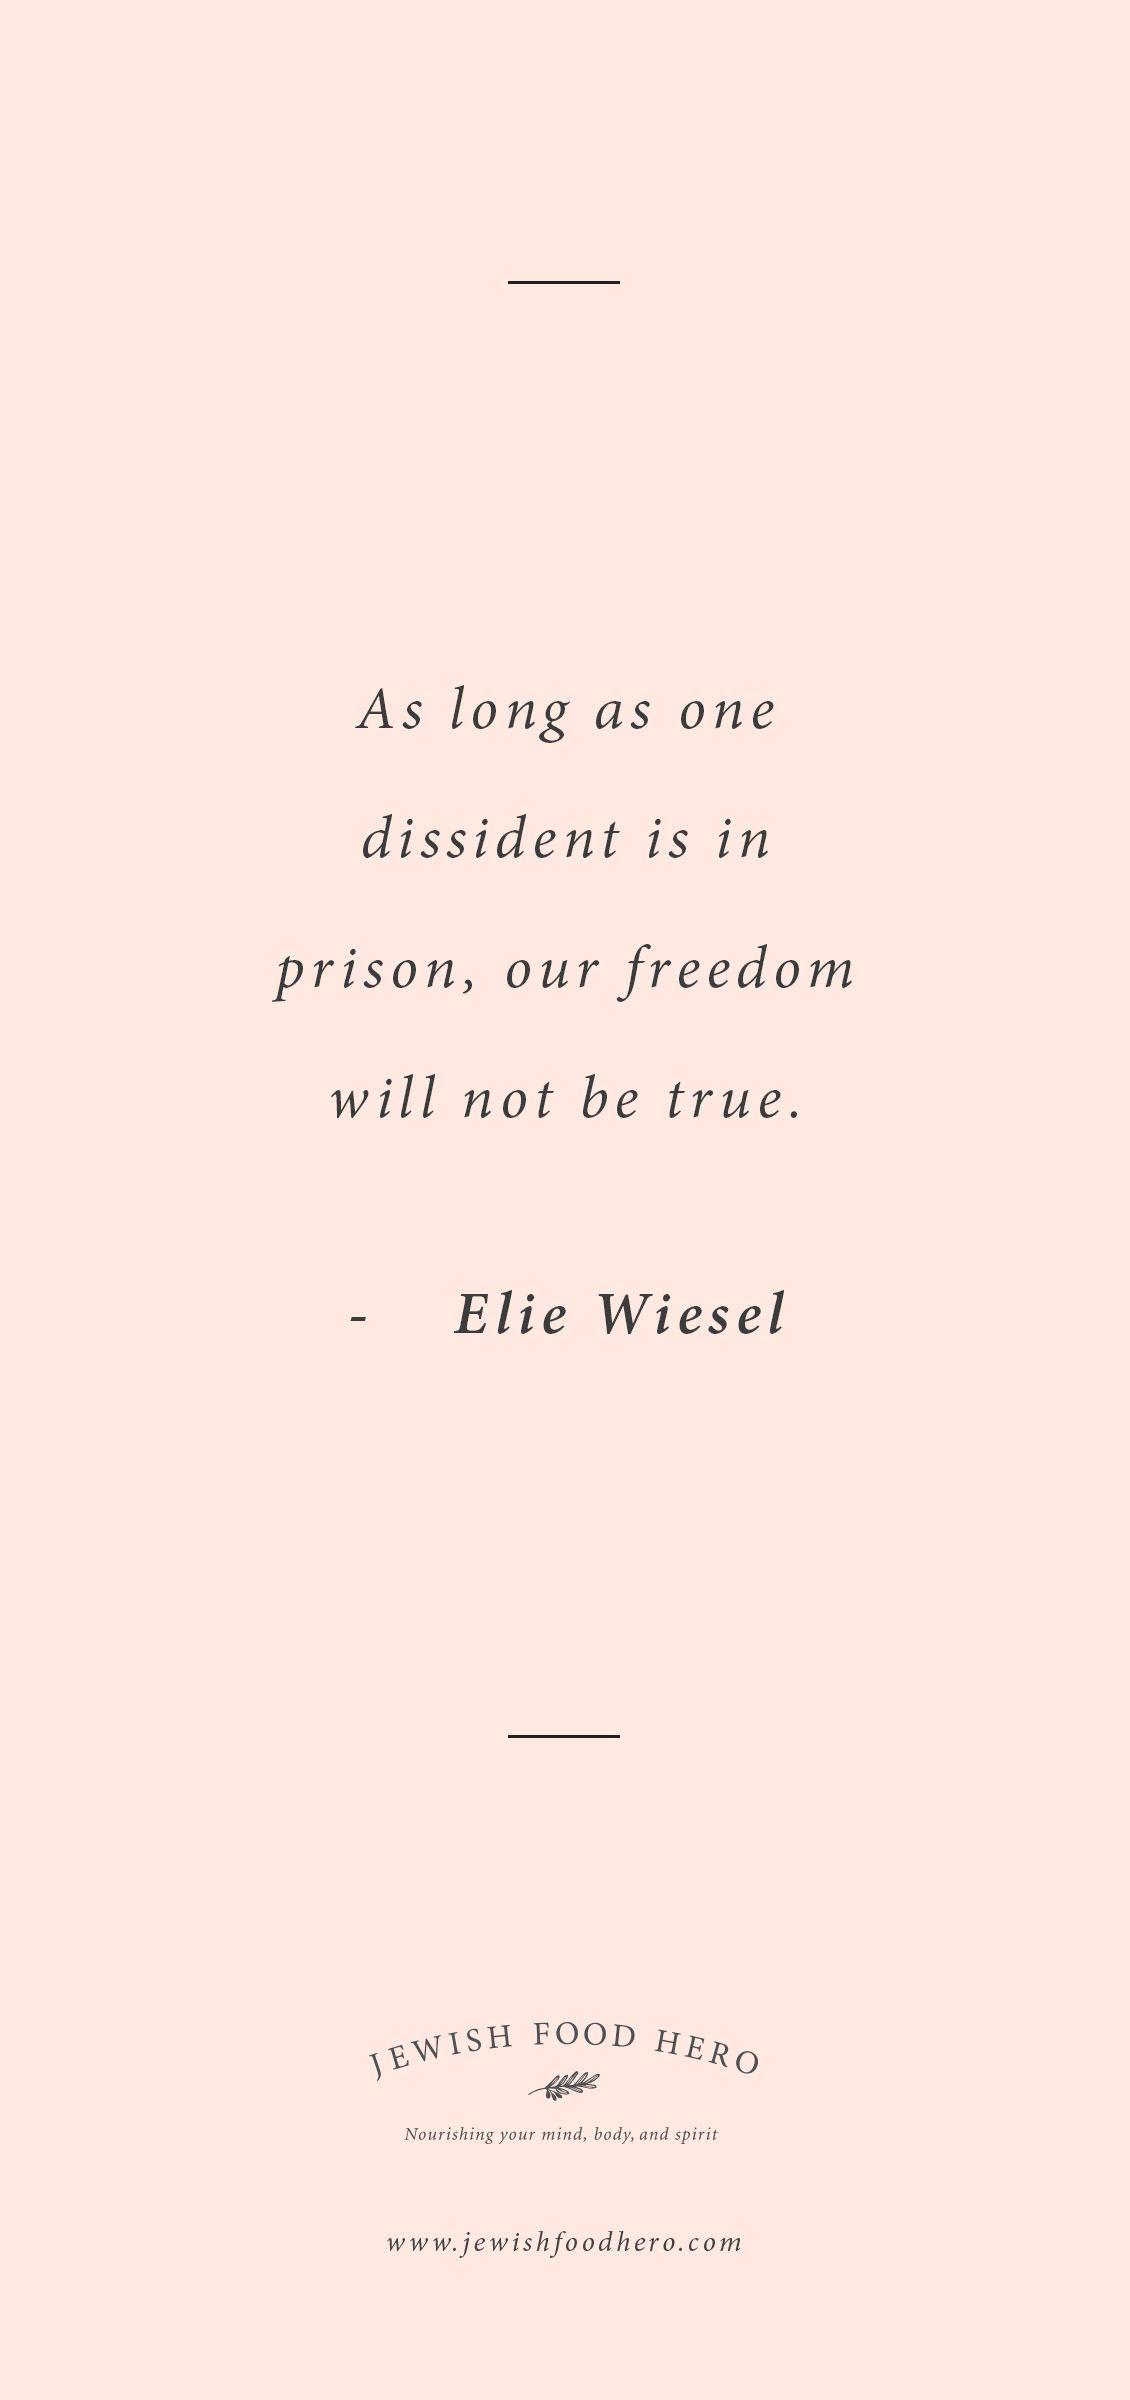 Jewish Quotes On Freedom Jewish Food Hero Jewish Quotes Freedom Quotes Quotes